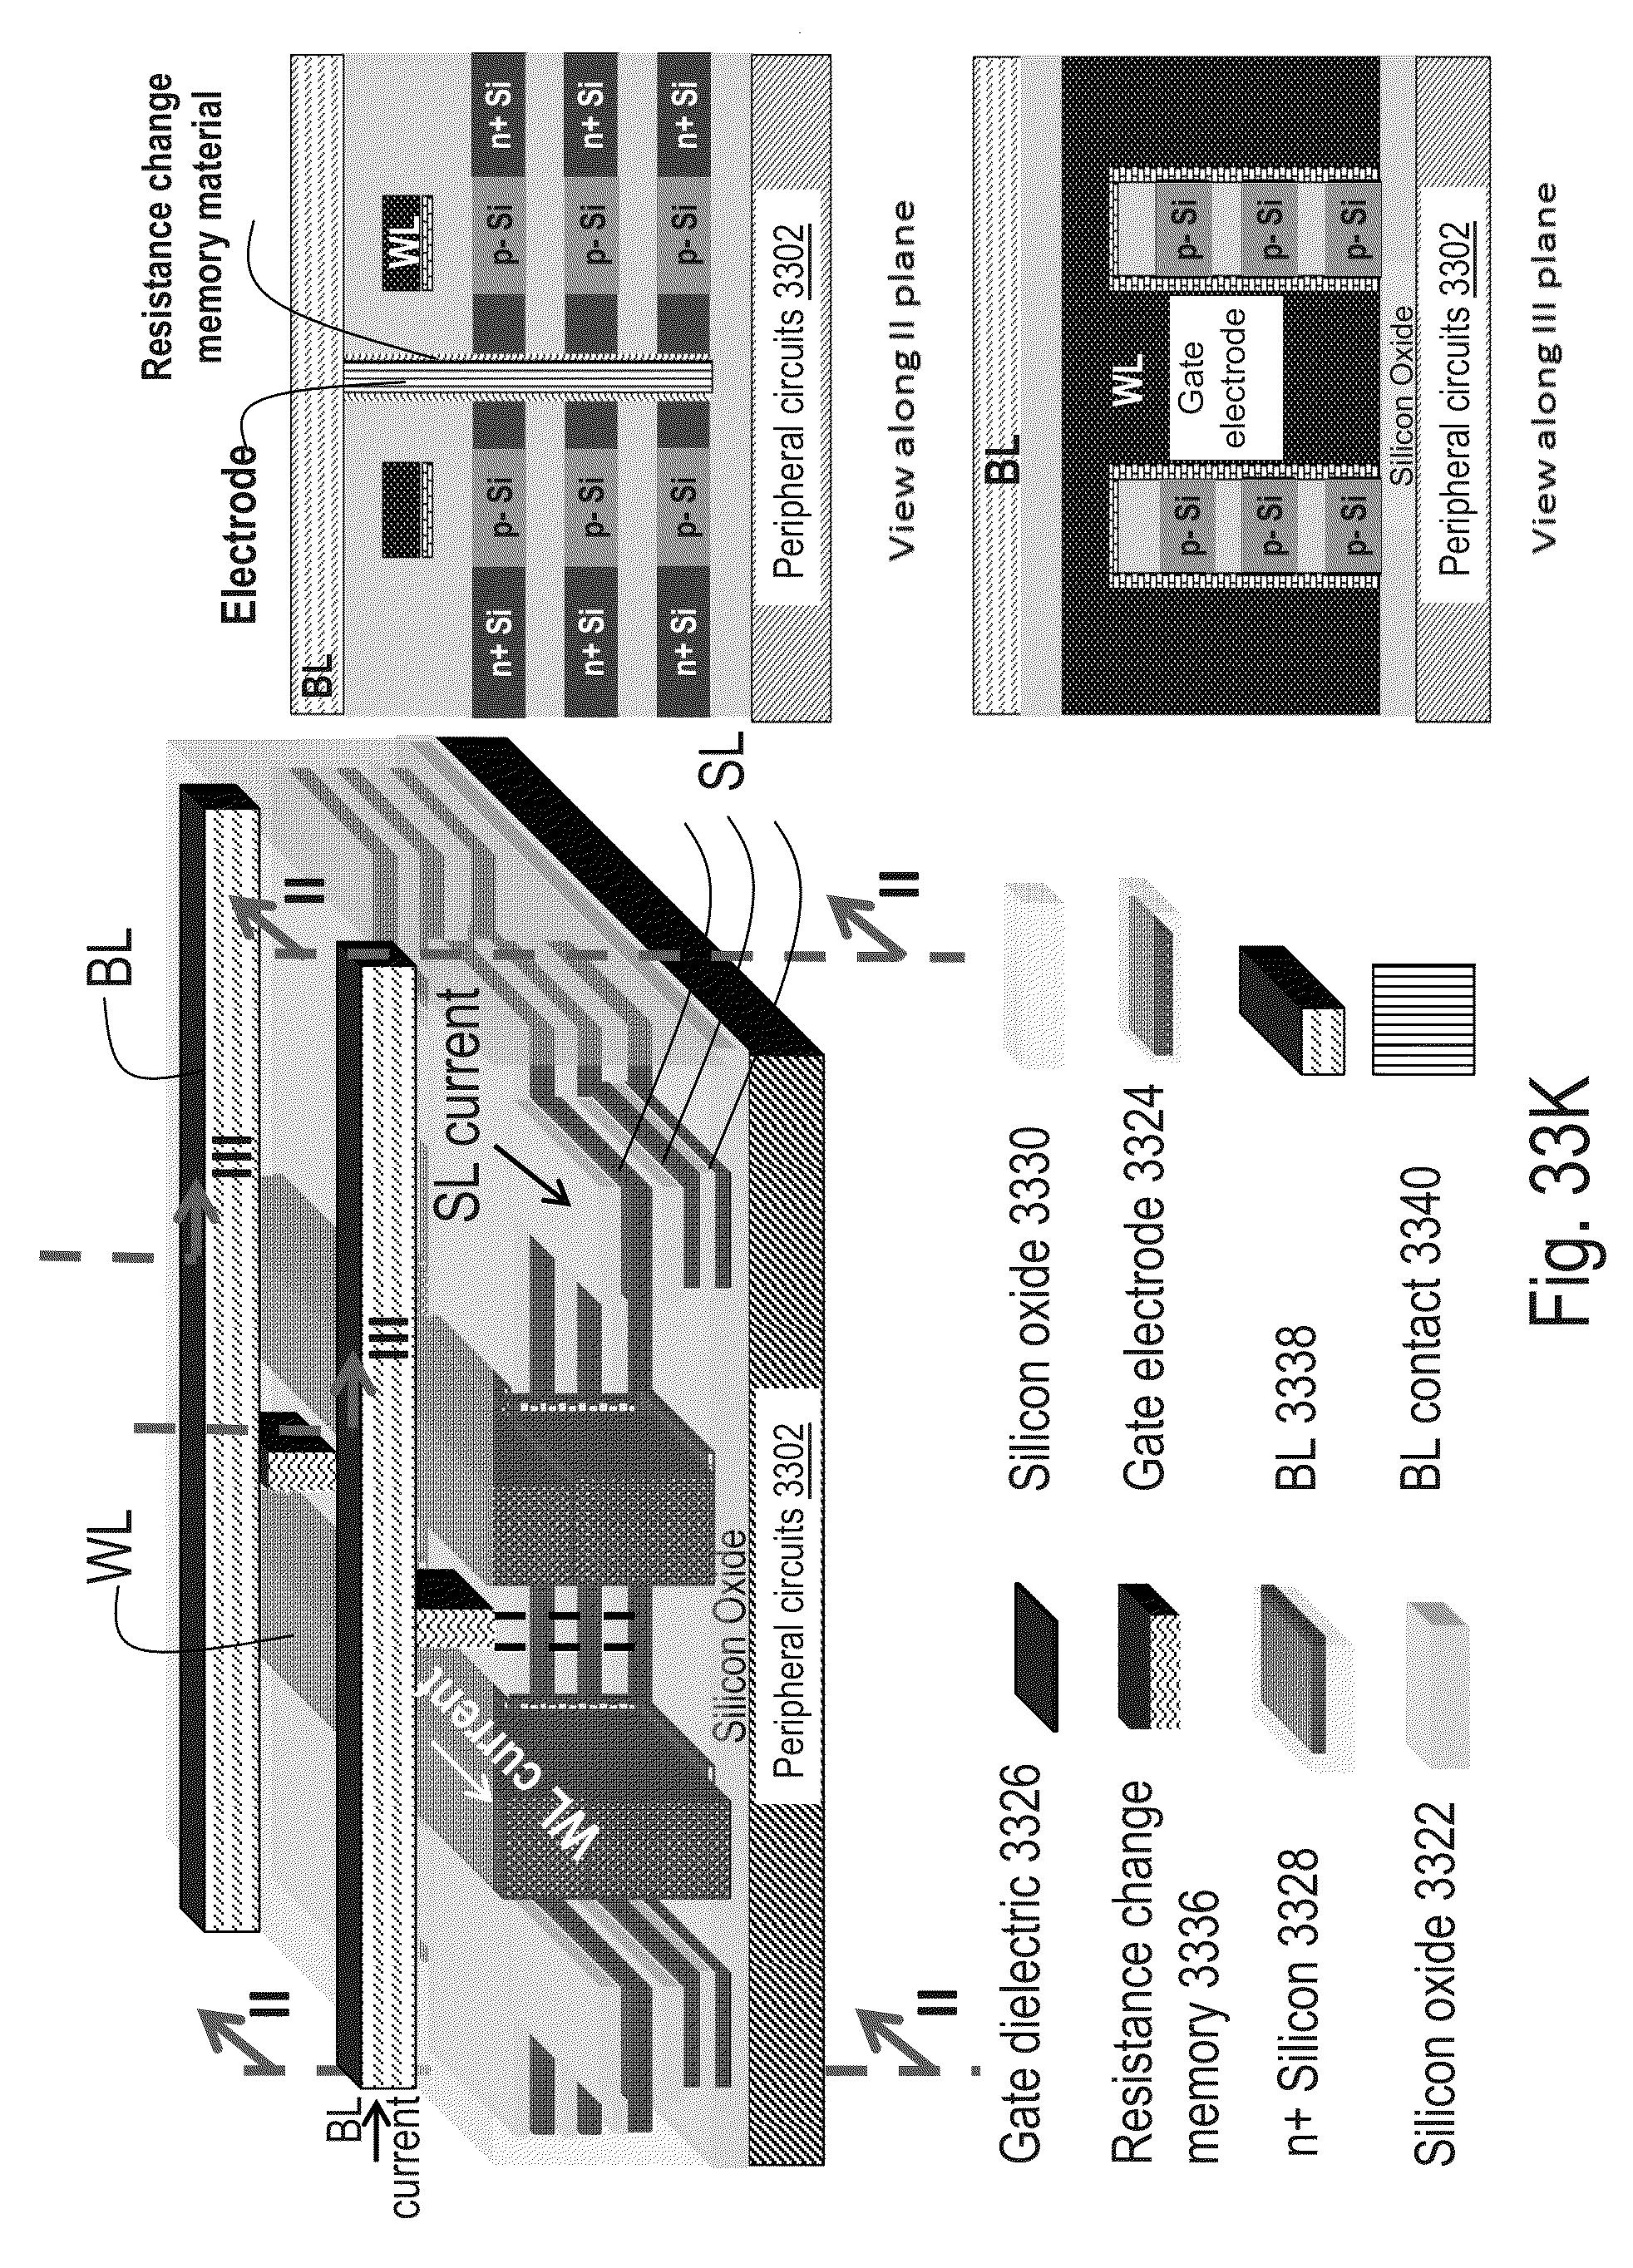 Patent Us 9219005 B2 Car Parking Guard Circuit Using Infrared Sensor Explanation Images